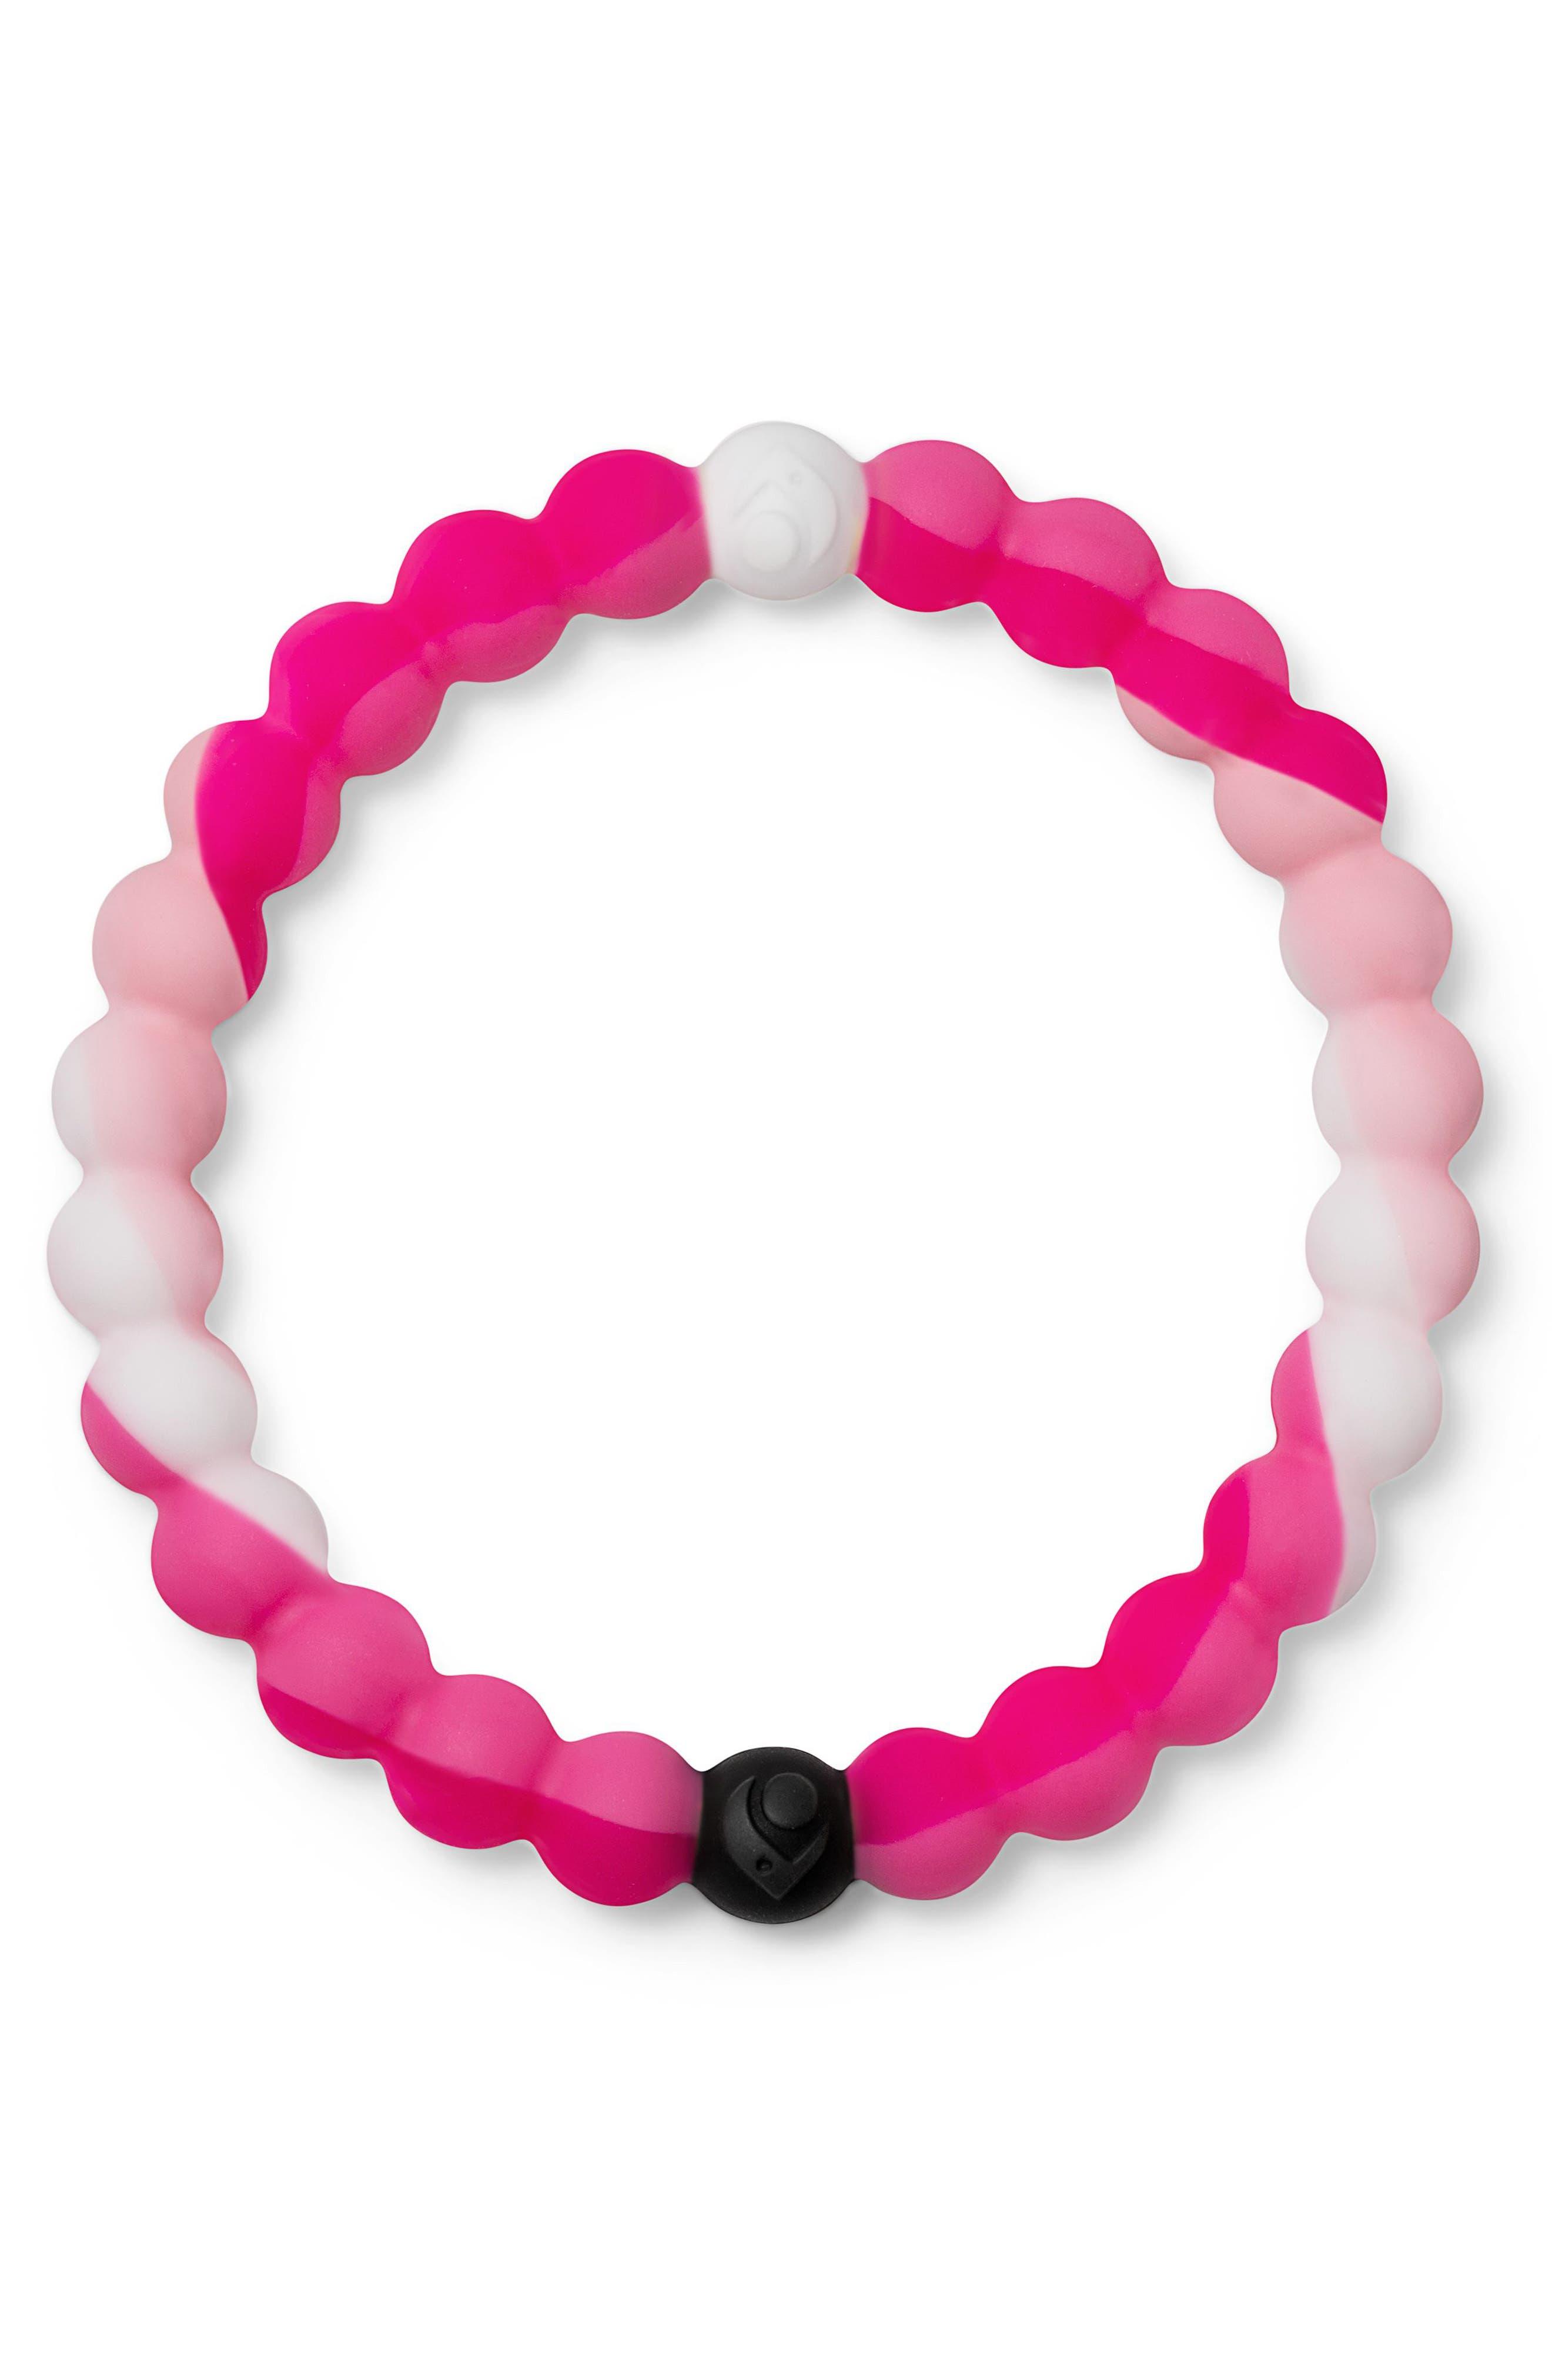 Main Image - Lokai Limited Edition Pink Bracelet